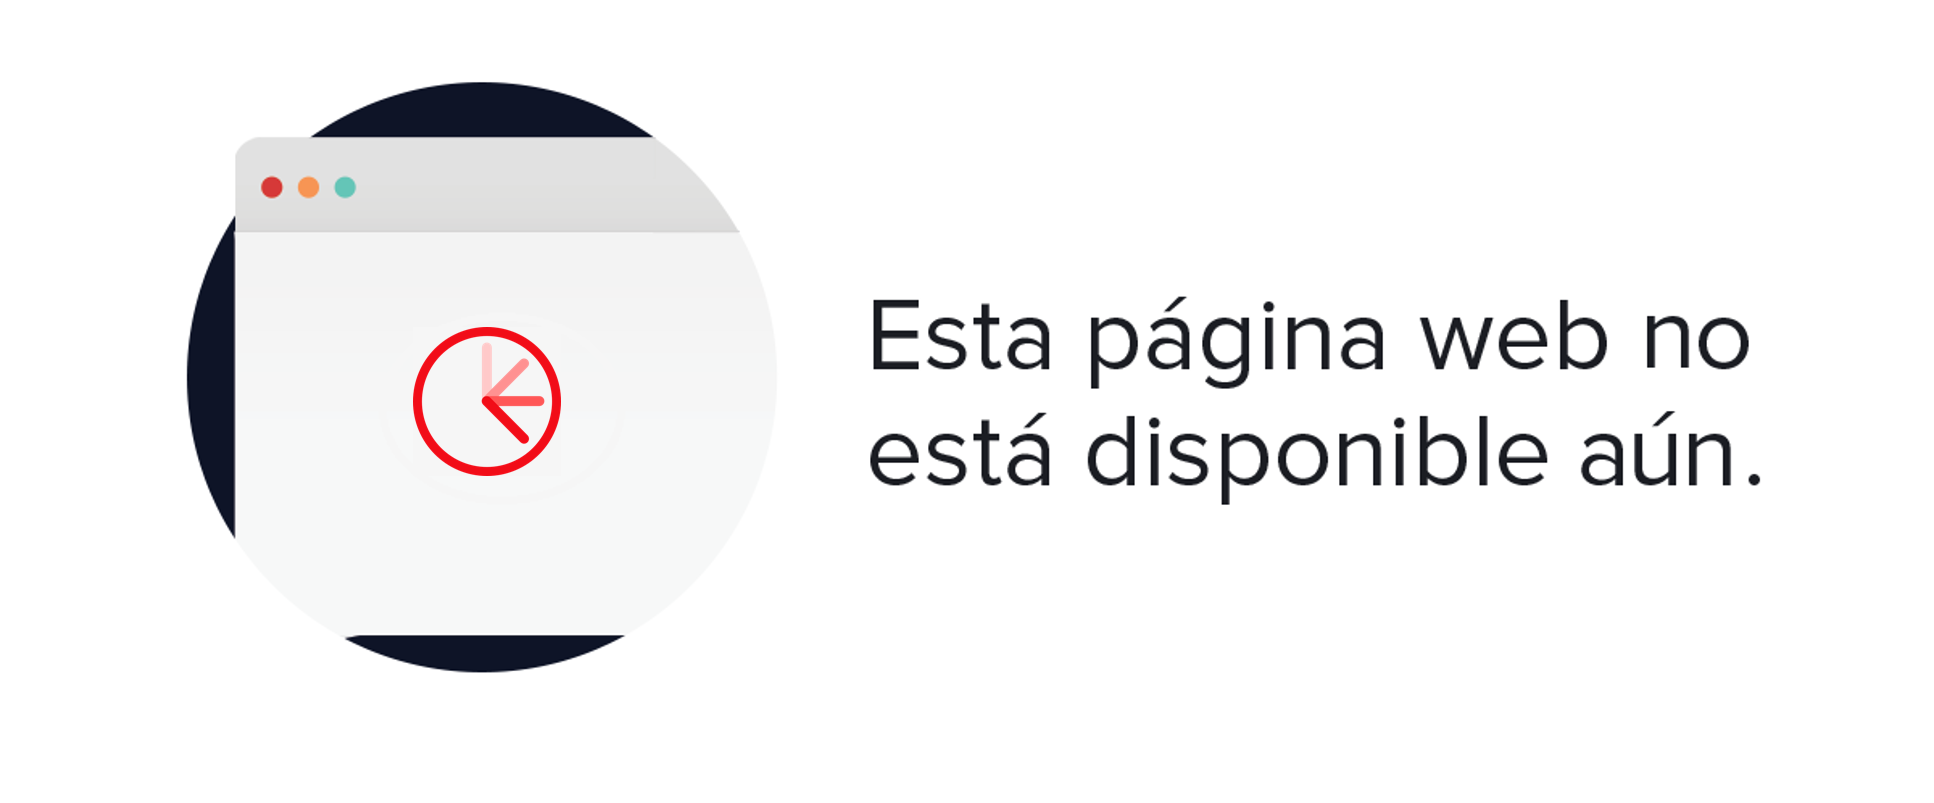 Chaqueta sudadera con capucha SHEEGO mujer gris melié 1Z1889880